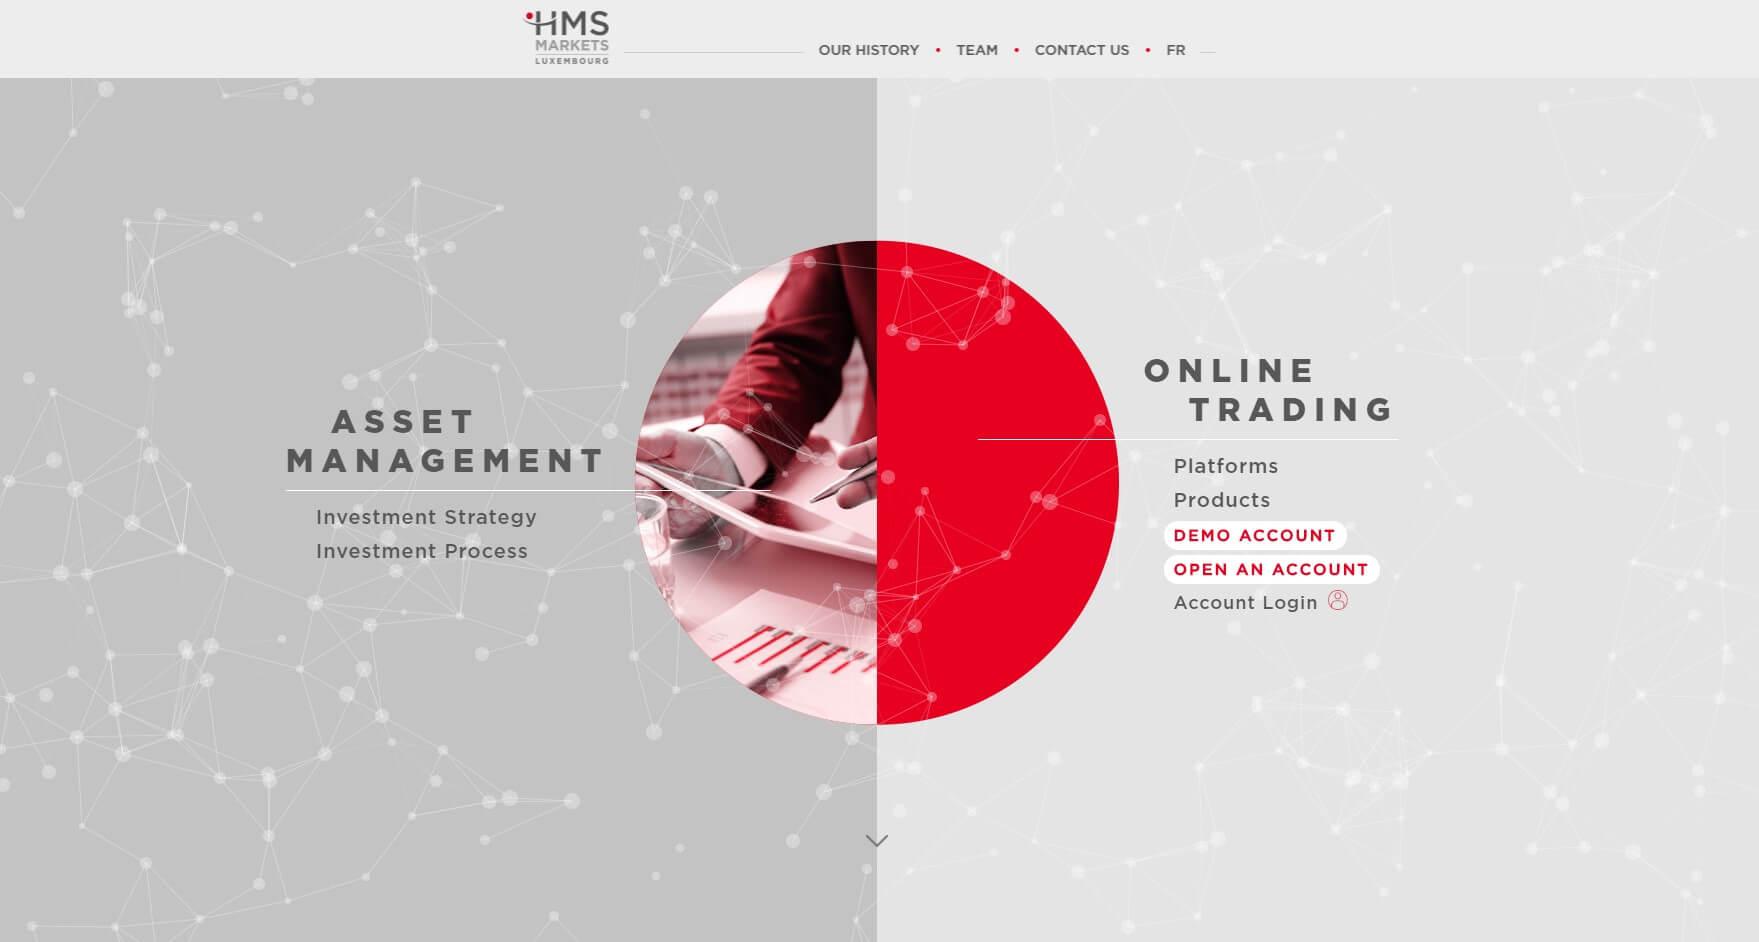 hms markets официальный сайт